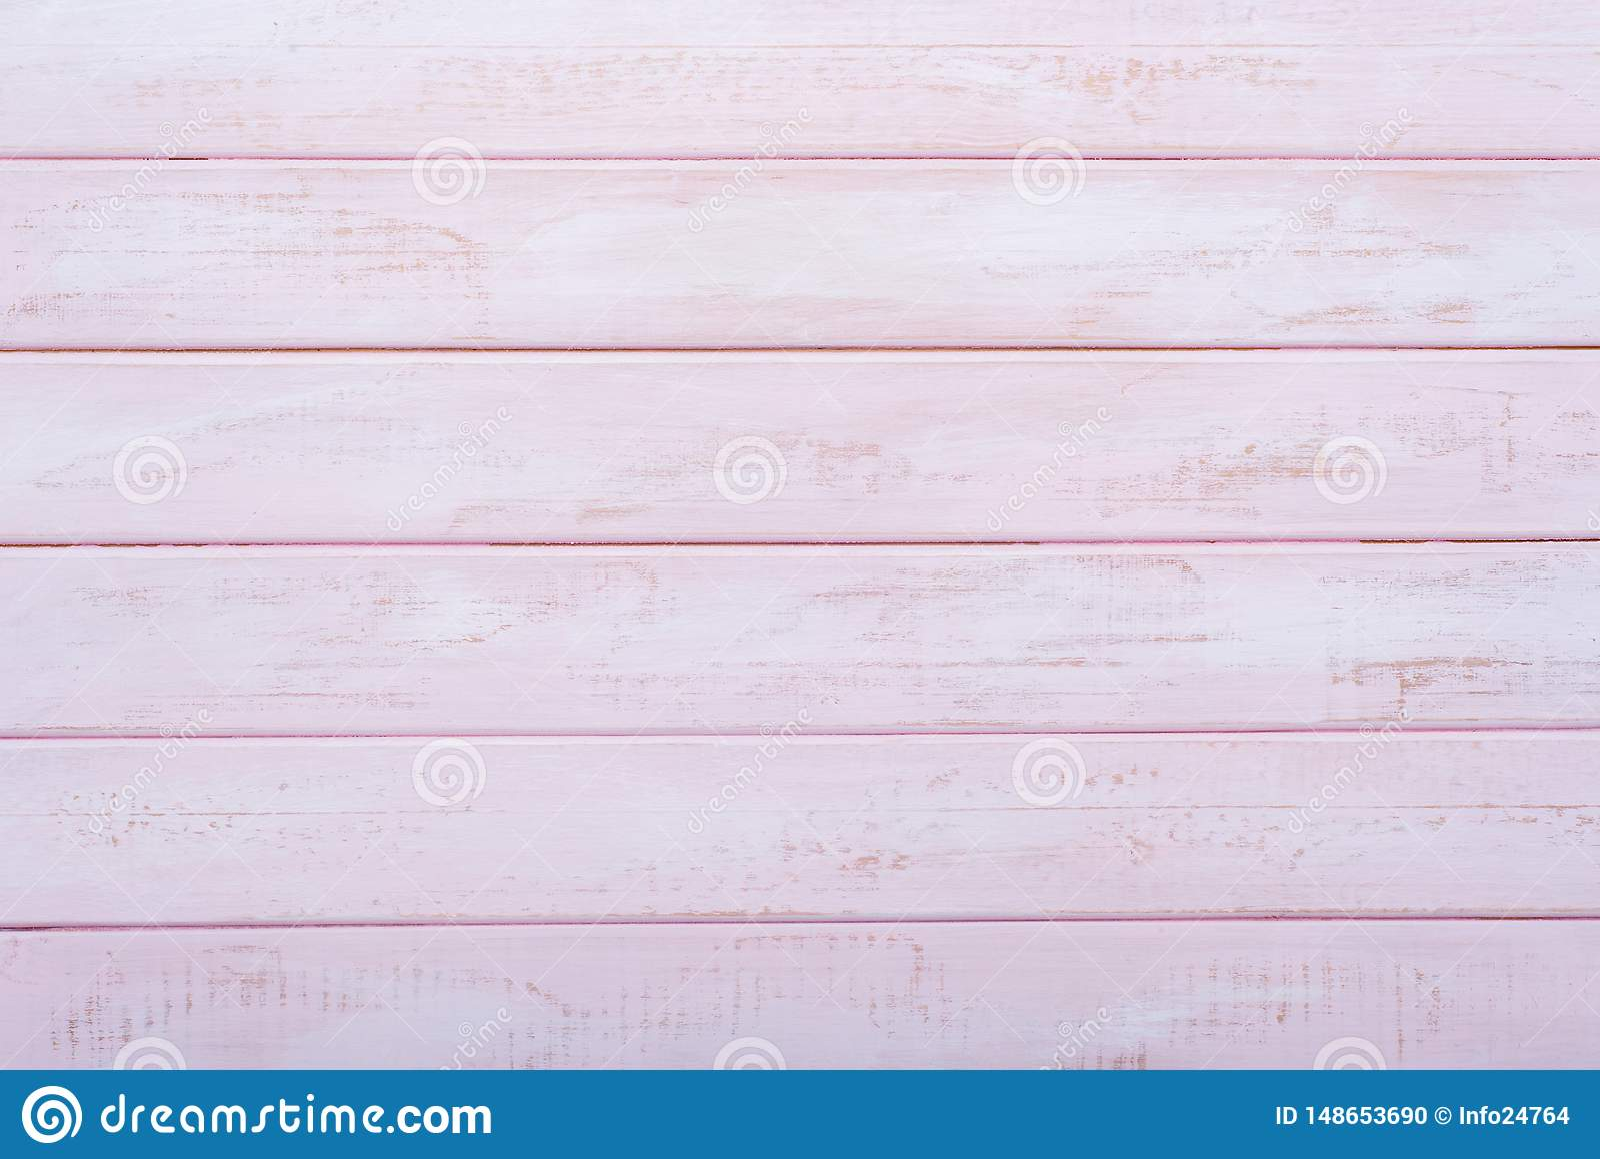 Fondo de madera rosado de la pared Endecha plana